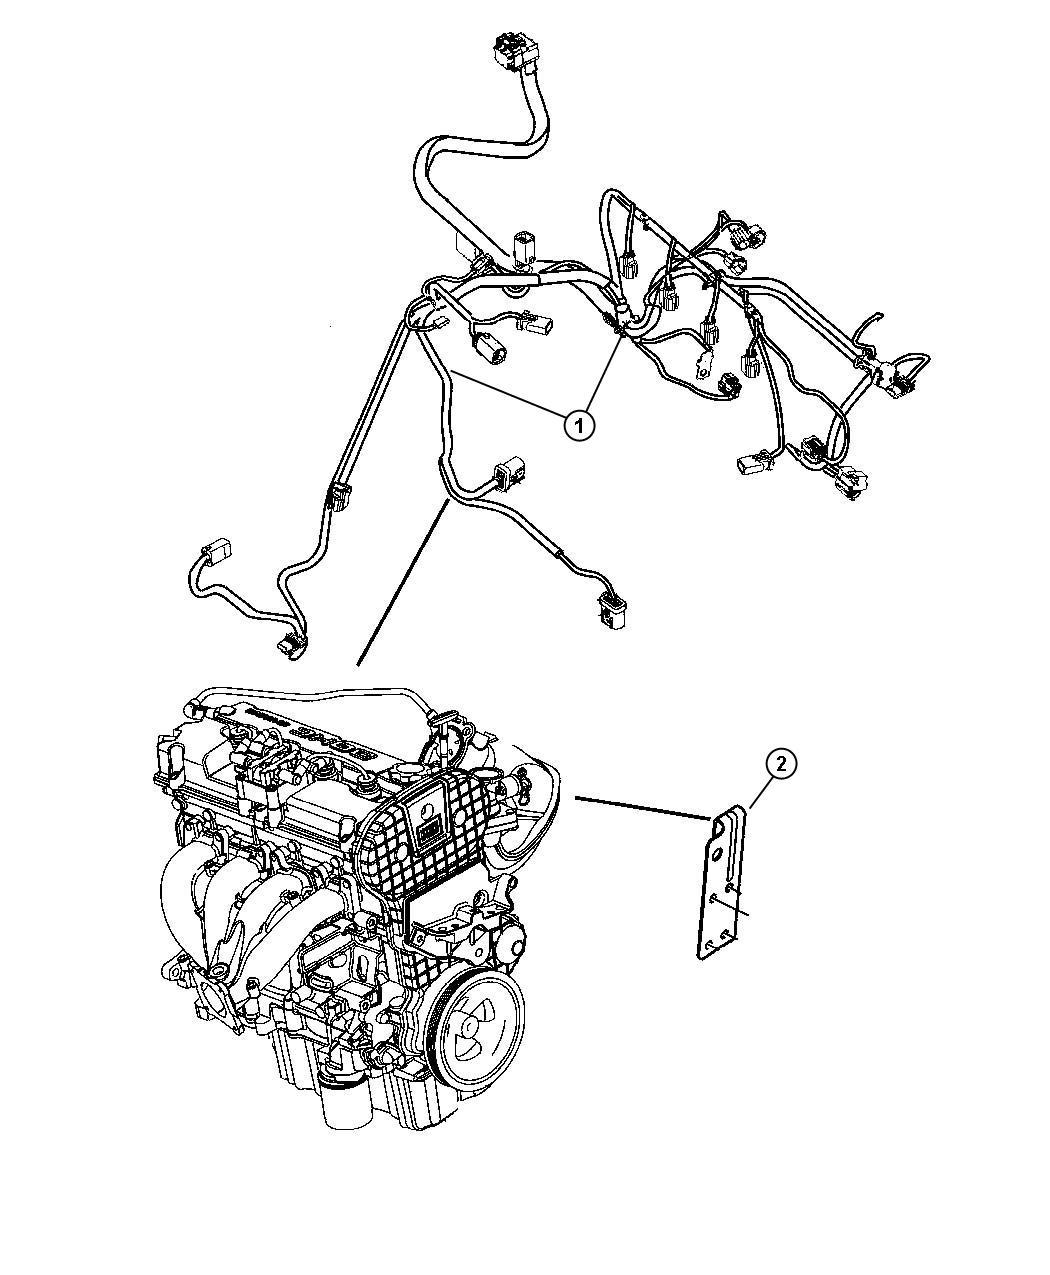 2007 Chrysler Sebring Bracket. Engine wiring. Engine